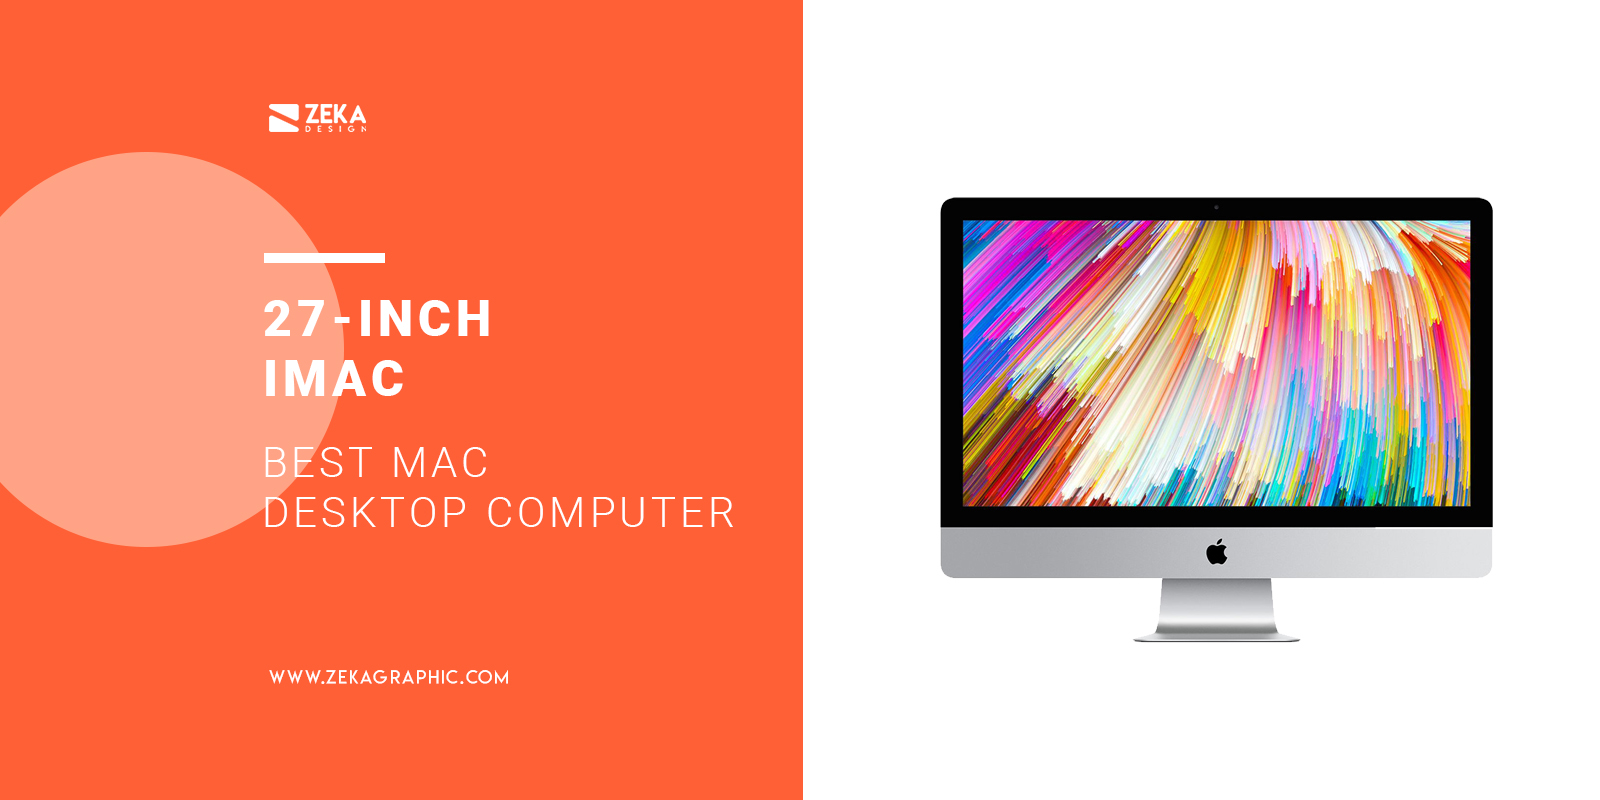 27-inch iMac Best Mac Desktop Computer For Graphic Designers